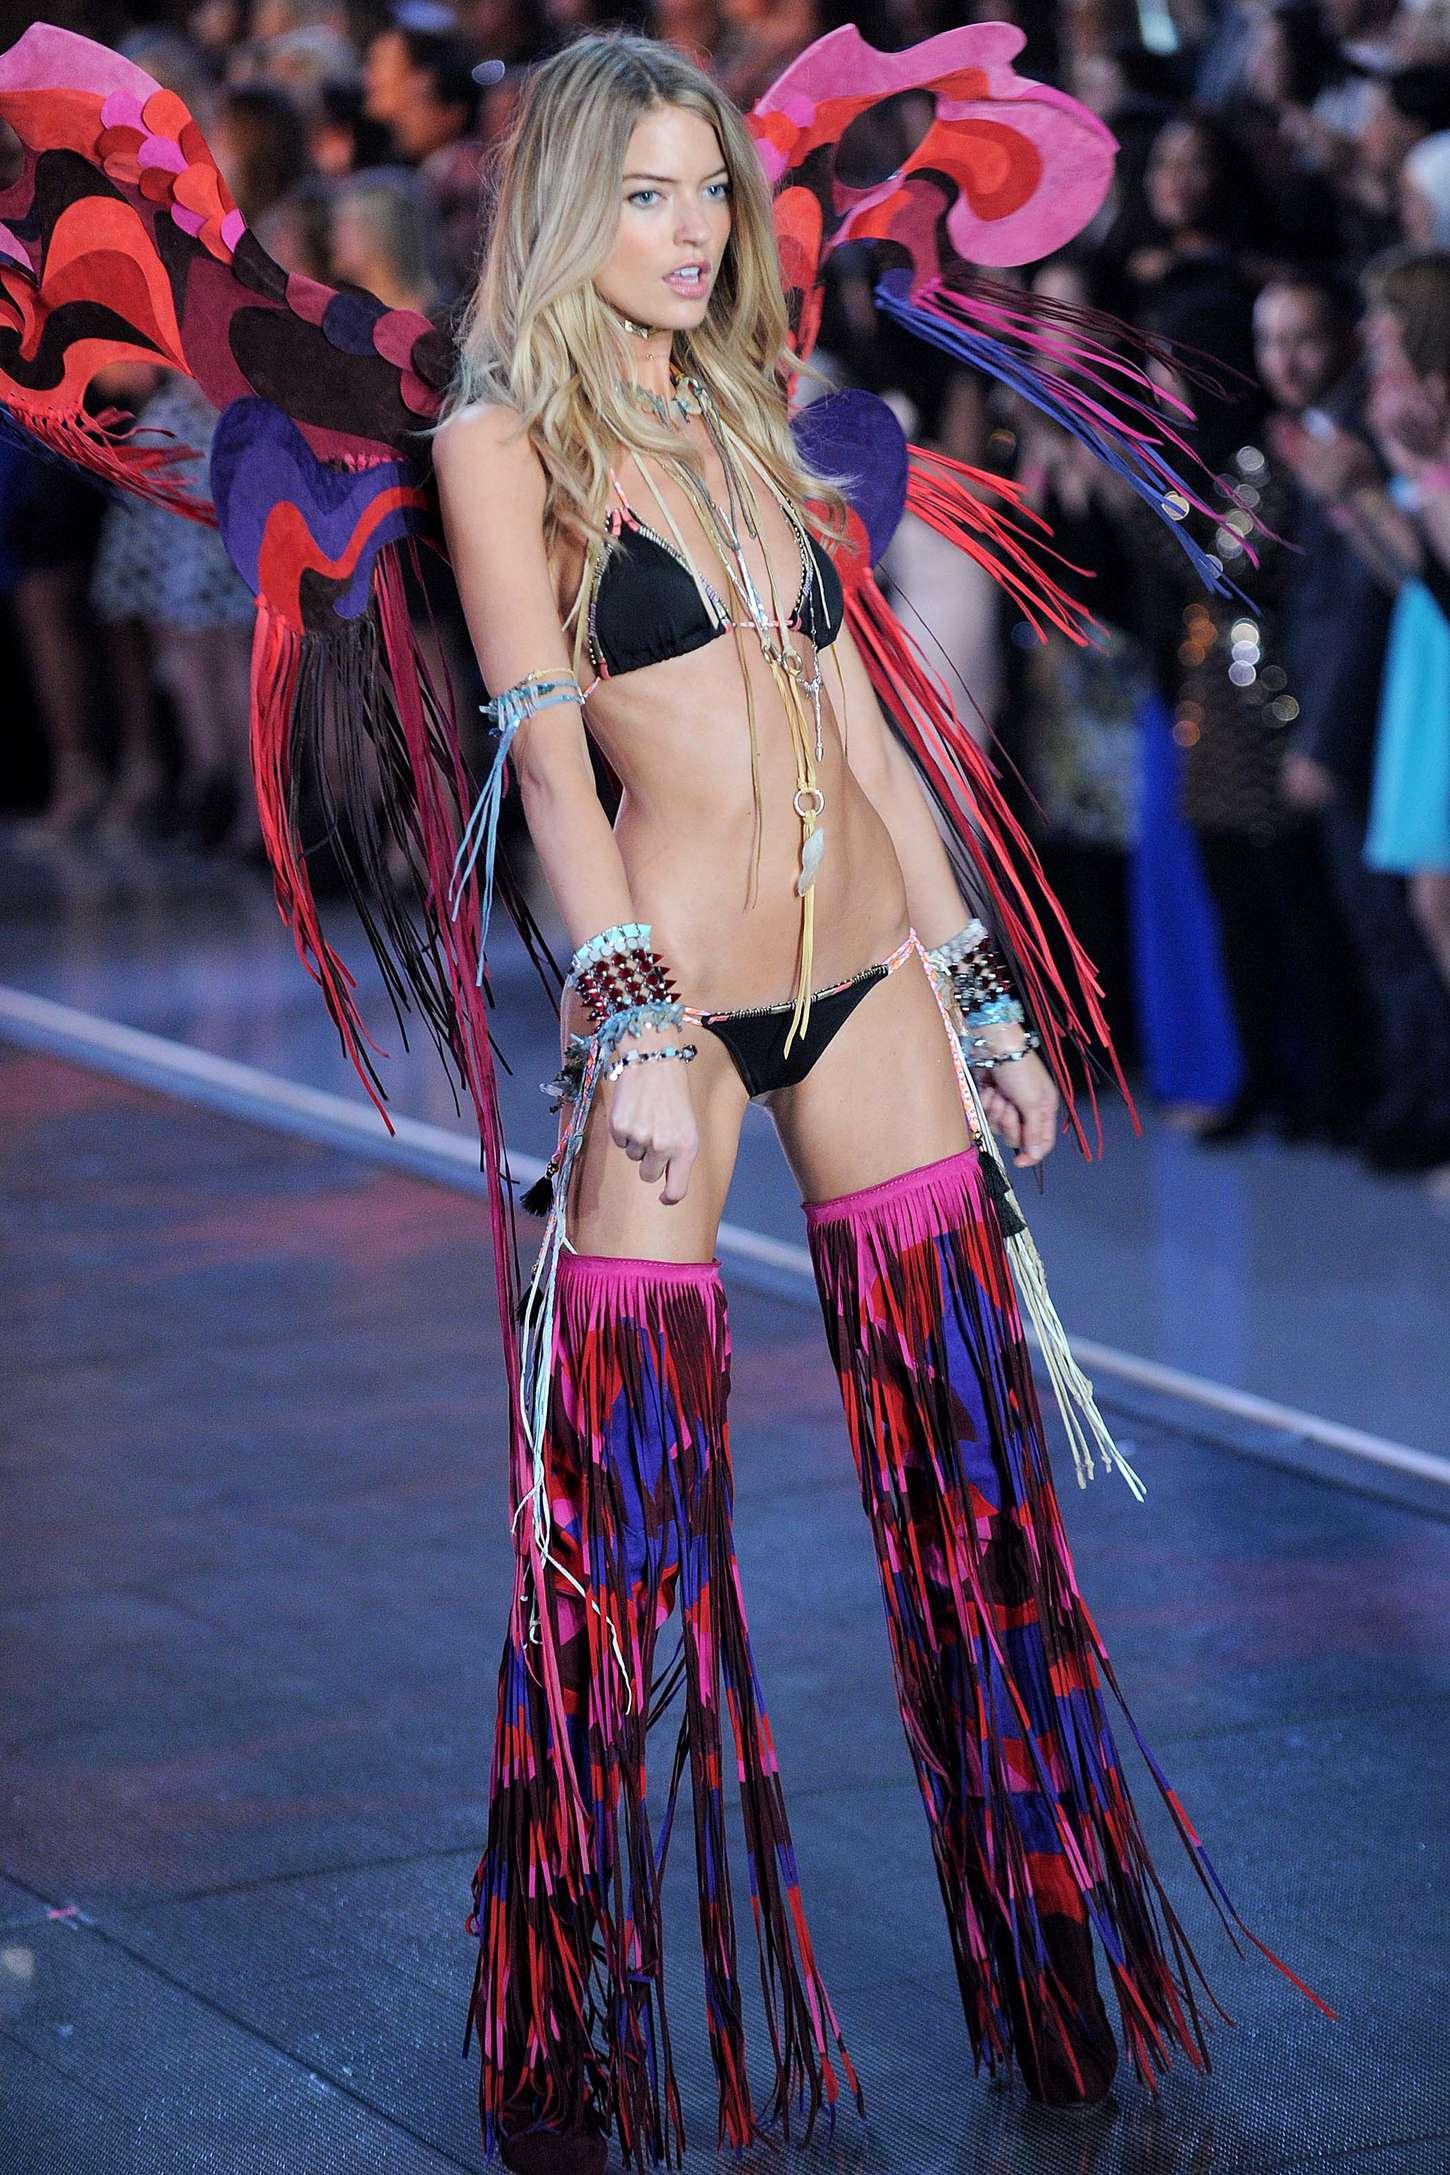 Handjob asian bikini dreamgirl calender